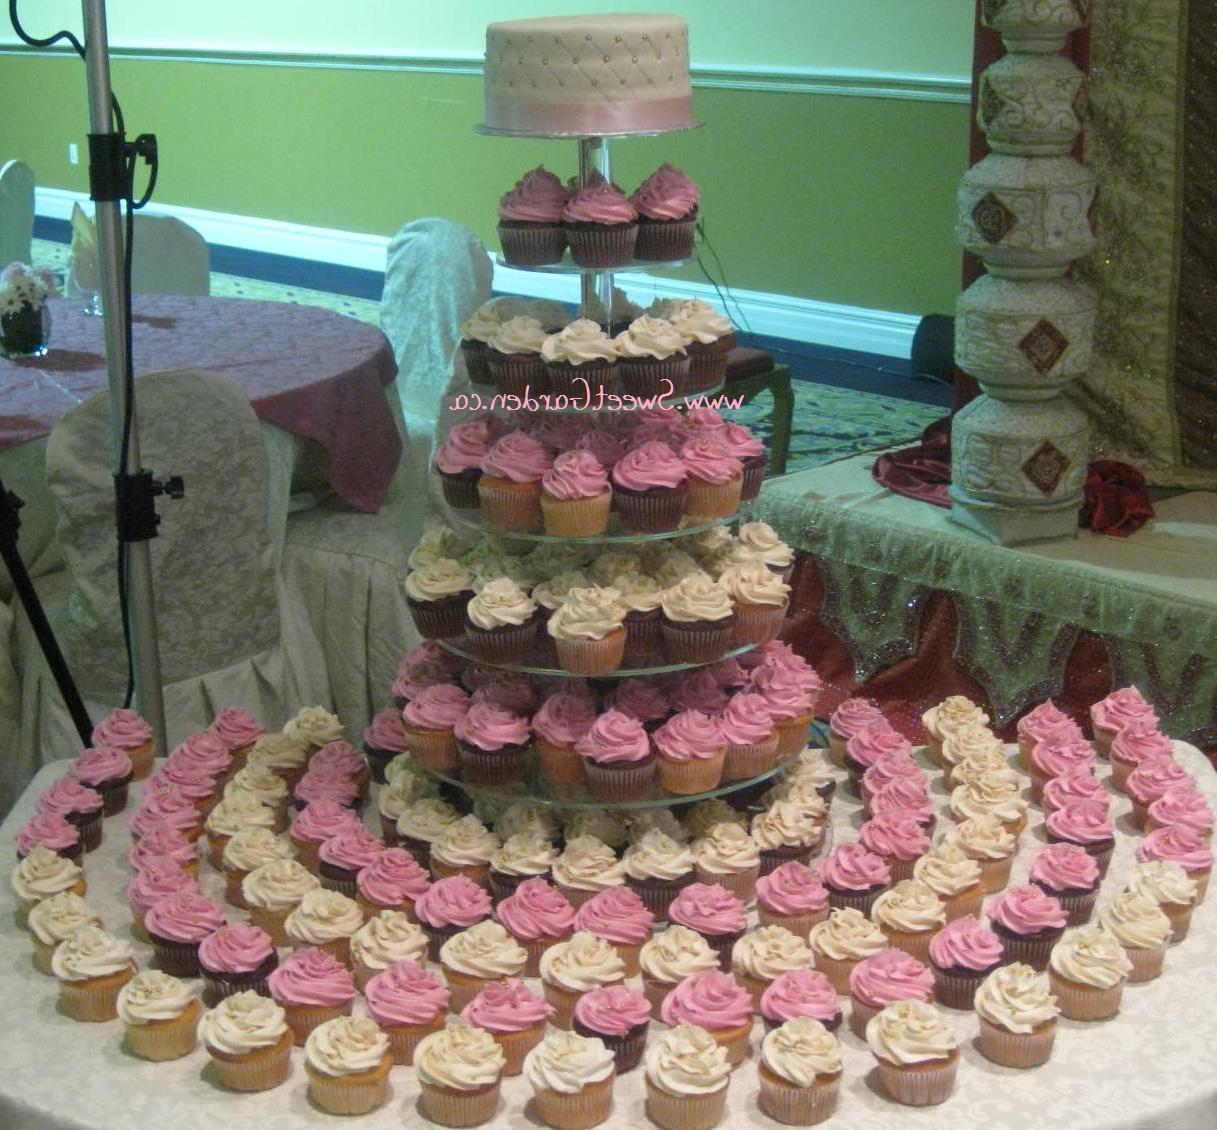 36 - Cupcake Tower